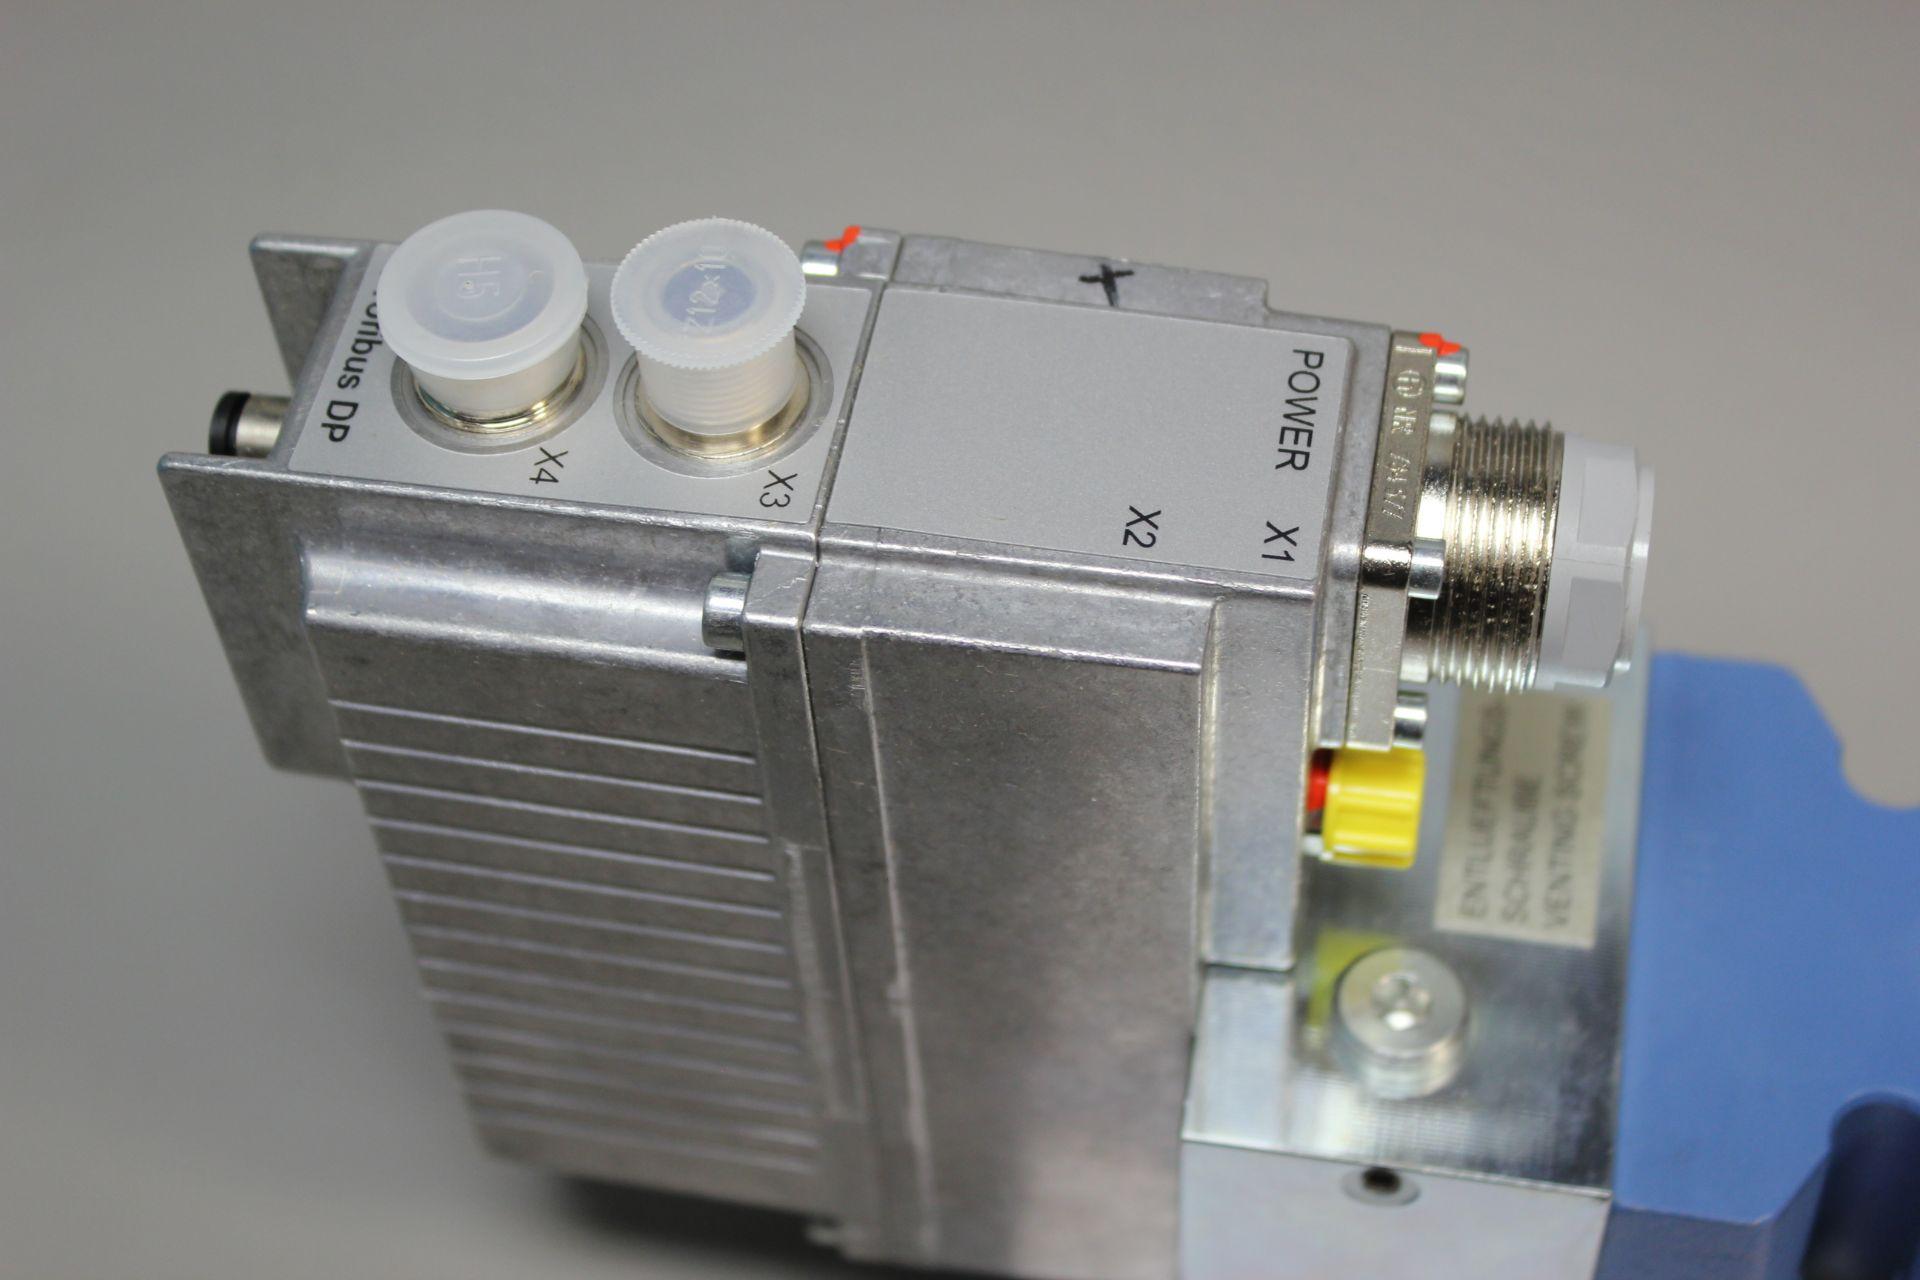 NEW MOOG DIRECT DRIVE DIGITAL CONTROL HYDRAULIC SERVO VALVE - Image 6 of 14